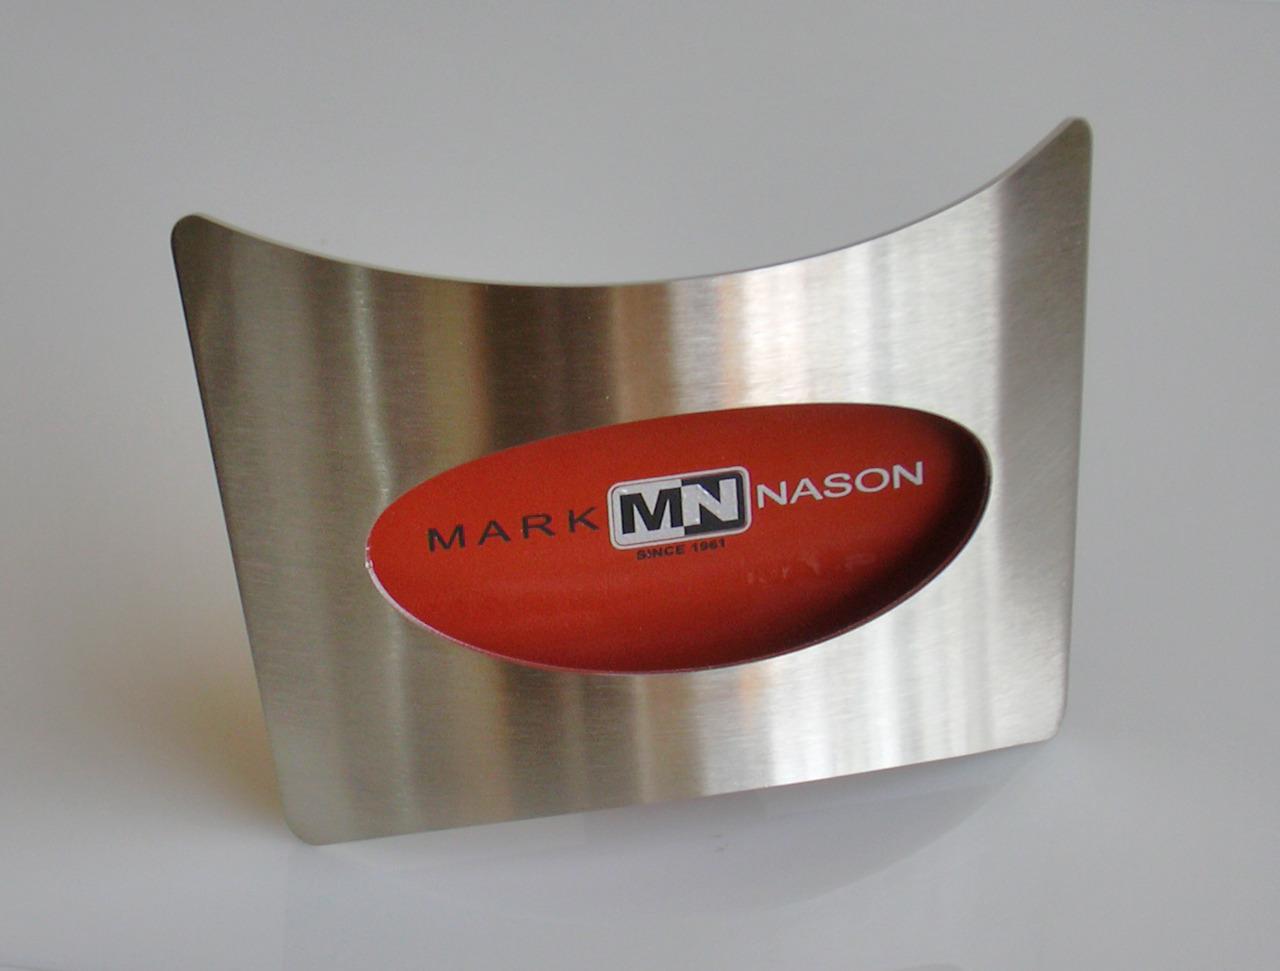 From OK Works, Signage and Shoe Riser Program for Mark Nason Shoes.   www.okworks.com